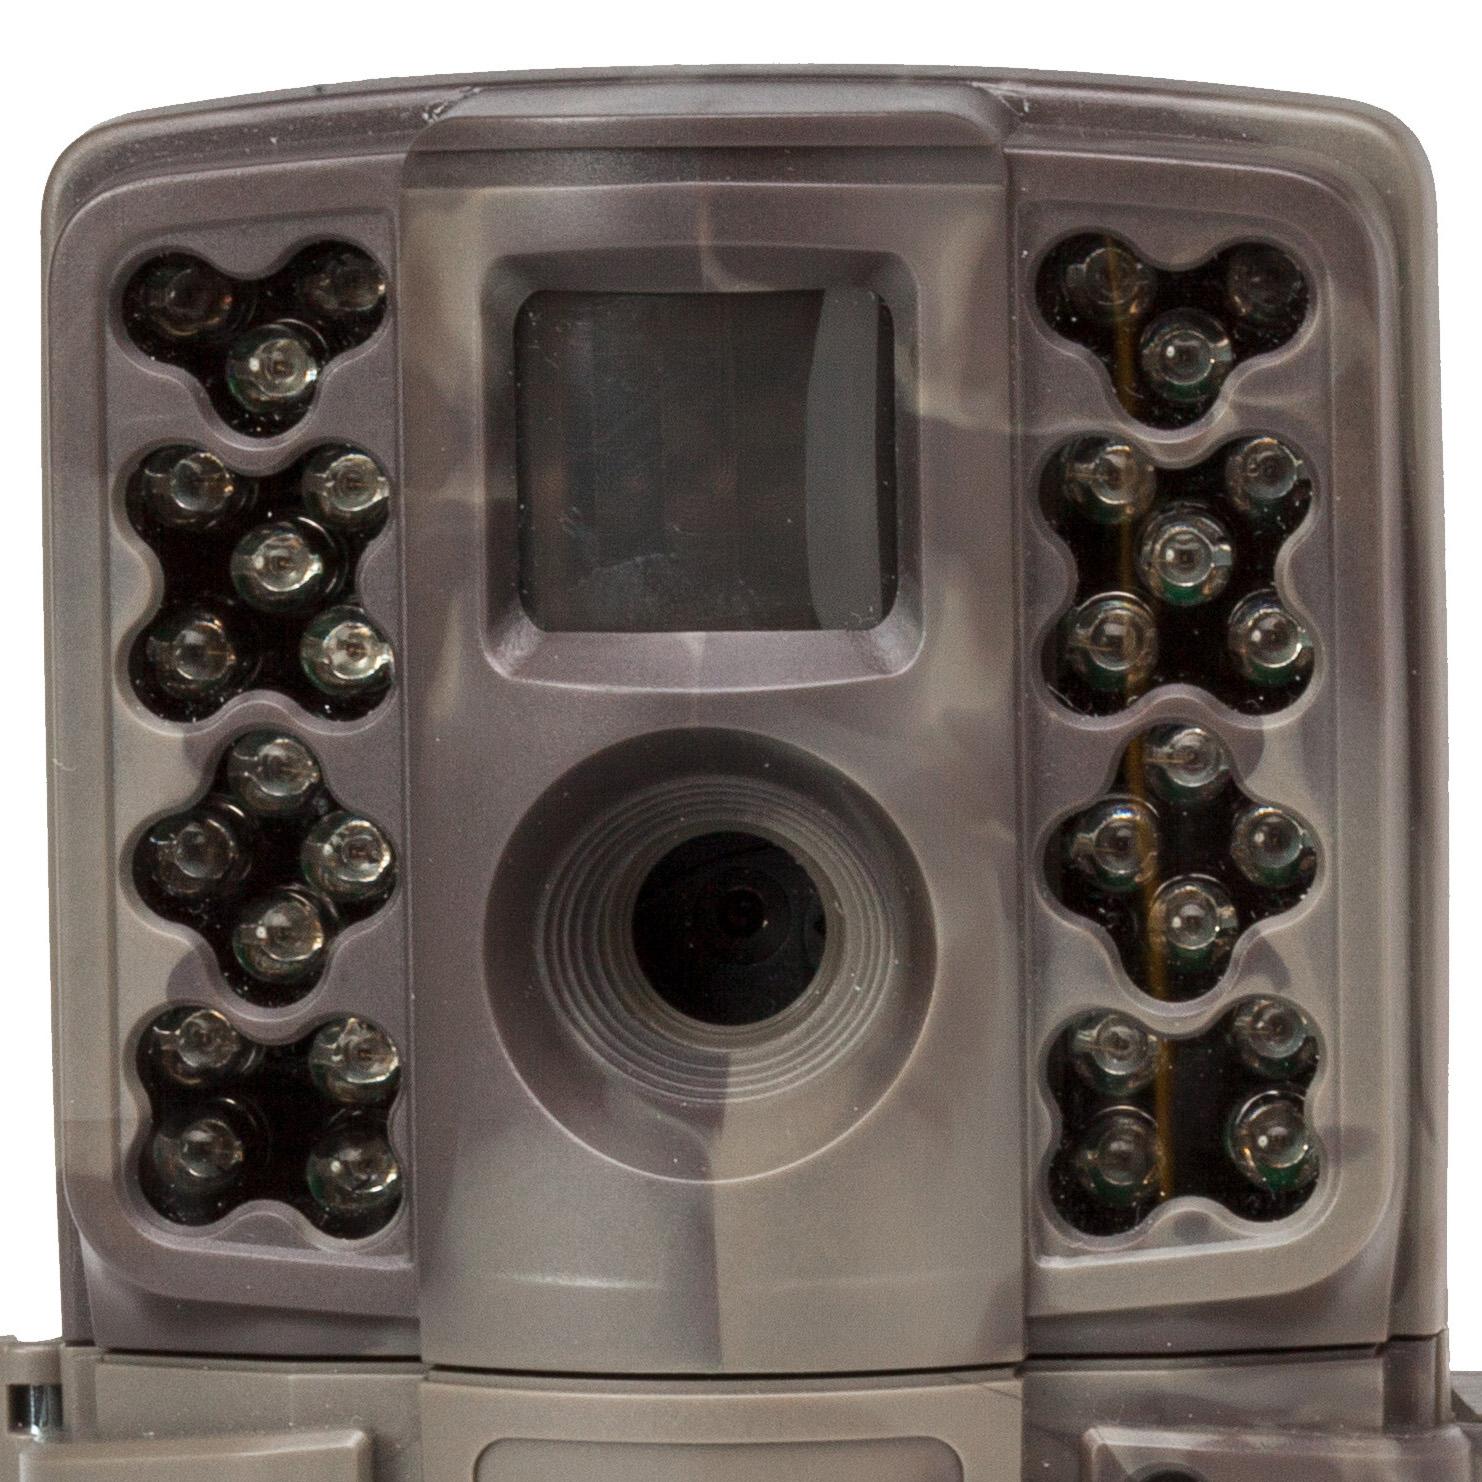 Moultrie Mobile Wireless Field Modem Mv1 >> Moultrie No Glow Invisible 12 MP Mini A20i IR Trail Game Camera + Field Modem   eBay